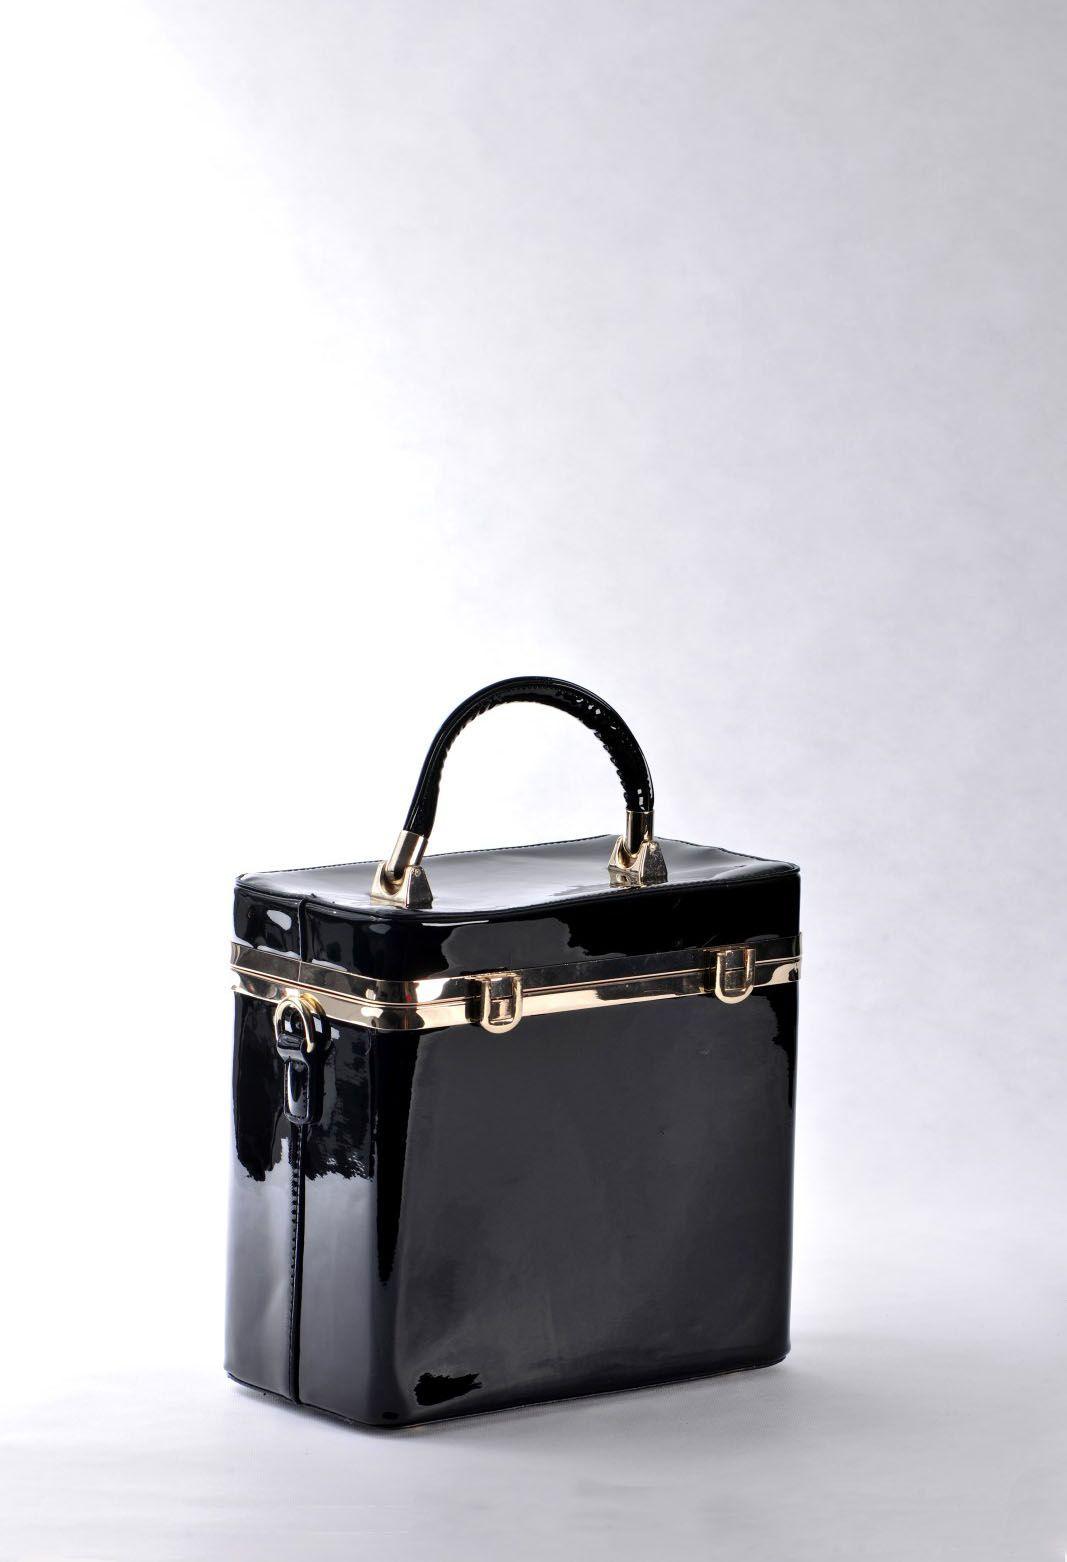 29985f21b84 Μαύρη Τσάντα Λουστρίνι, Ώμου – Χειρός, Τετράγωνη. Ιδιαίτερο, κομψό σχέδιο  με χρυσές λεπτομέρειες.